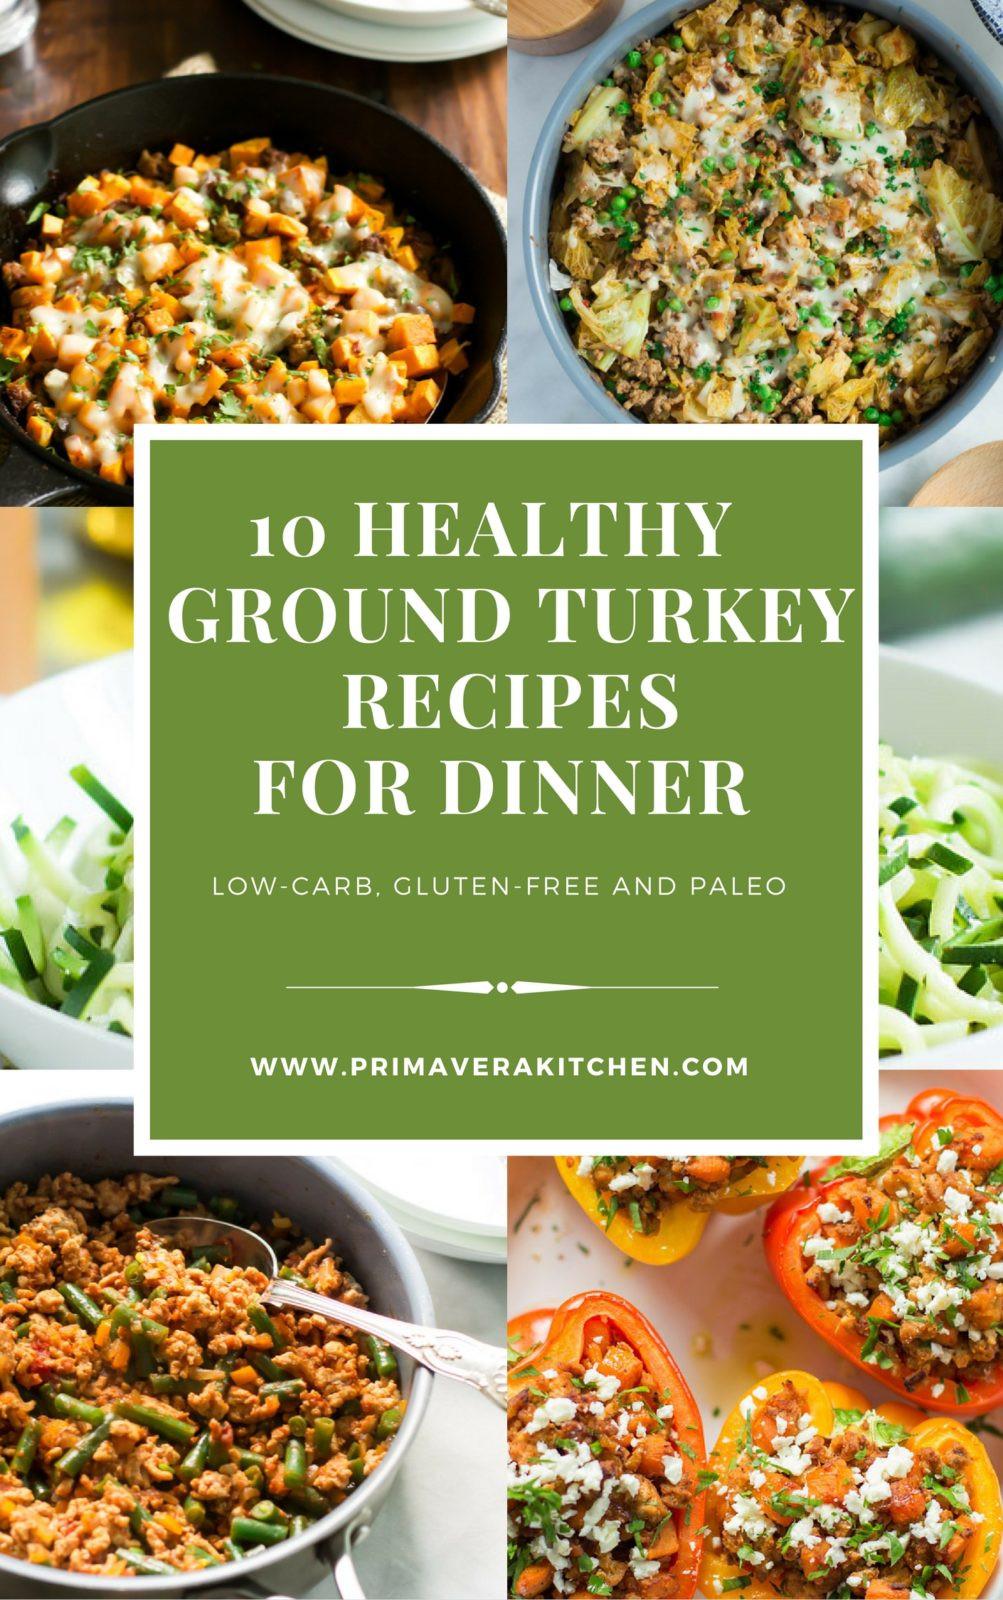 Healthy Recipes Using Ground Turkey  10 Healthy Ground Turkey Recipes for Dinner Primavera